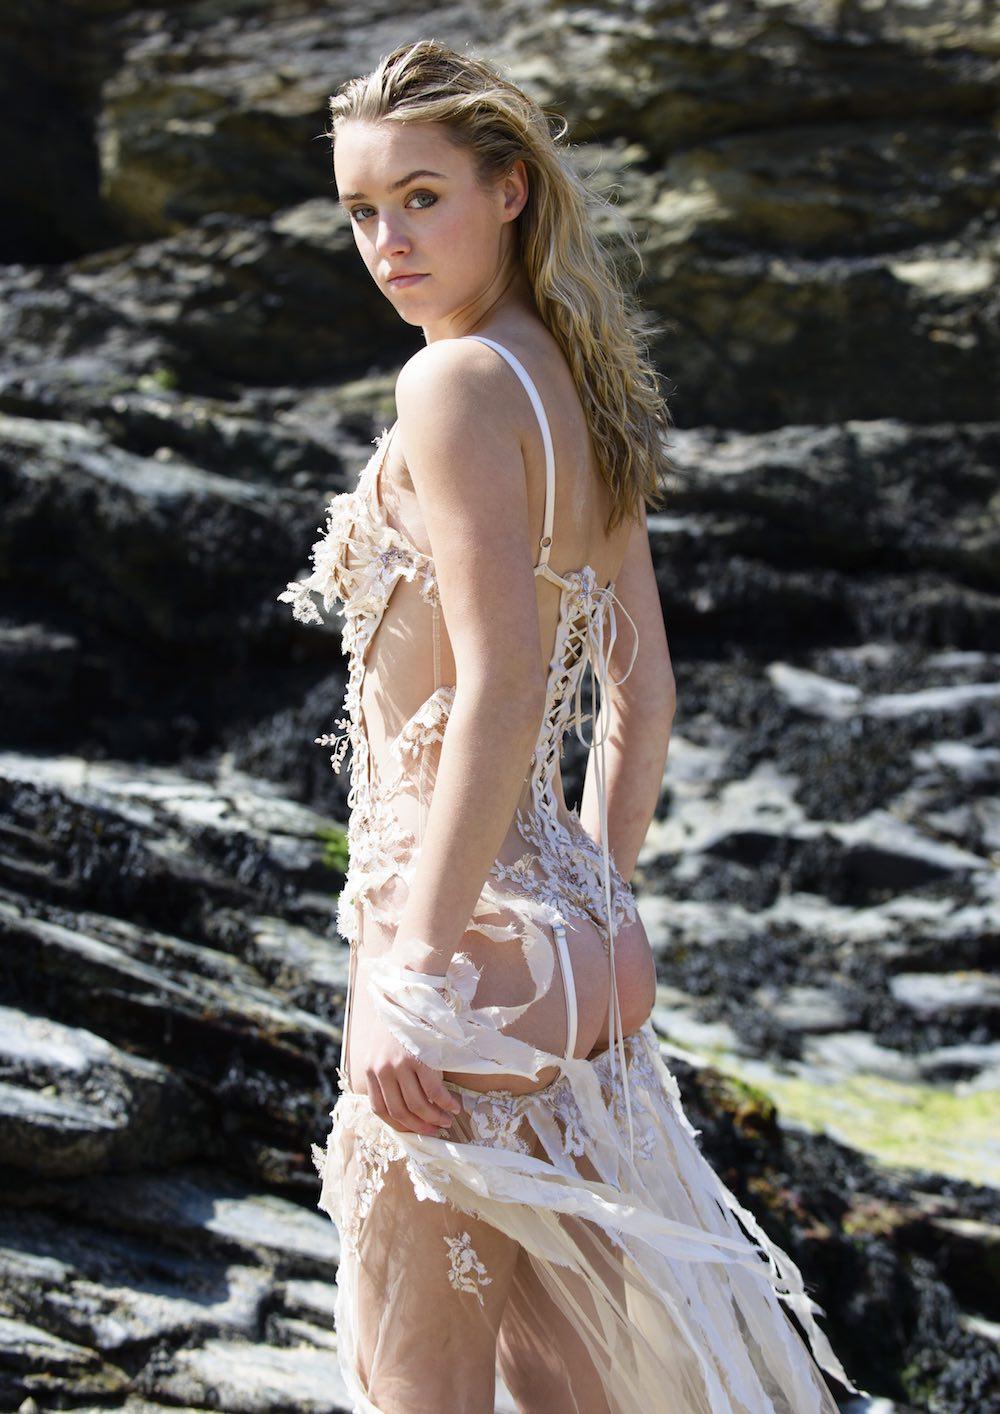 BA (Hons) Fashion Contour graduate Florence Morris-Clarke for LCFBA18.